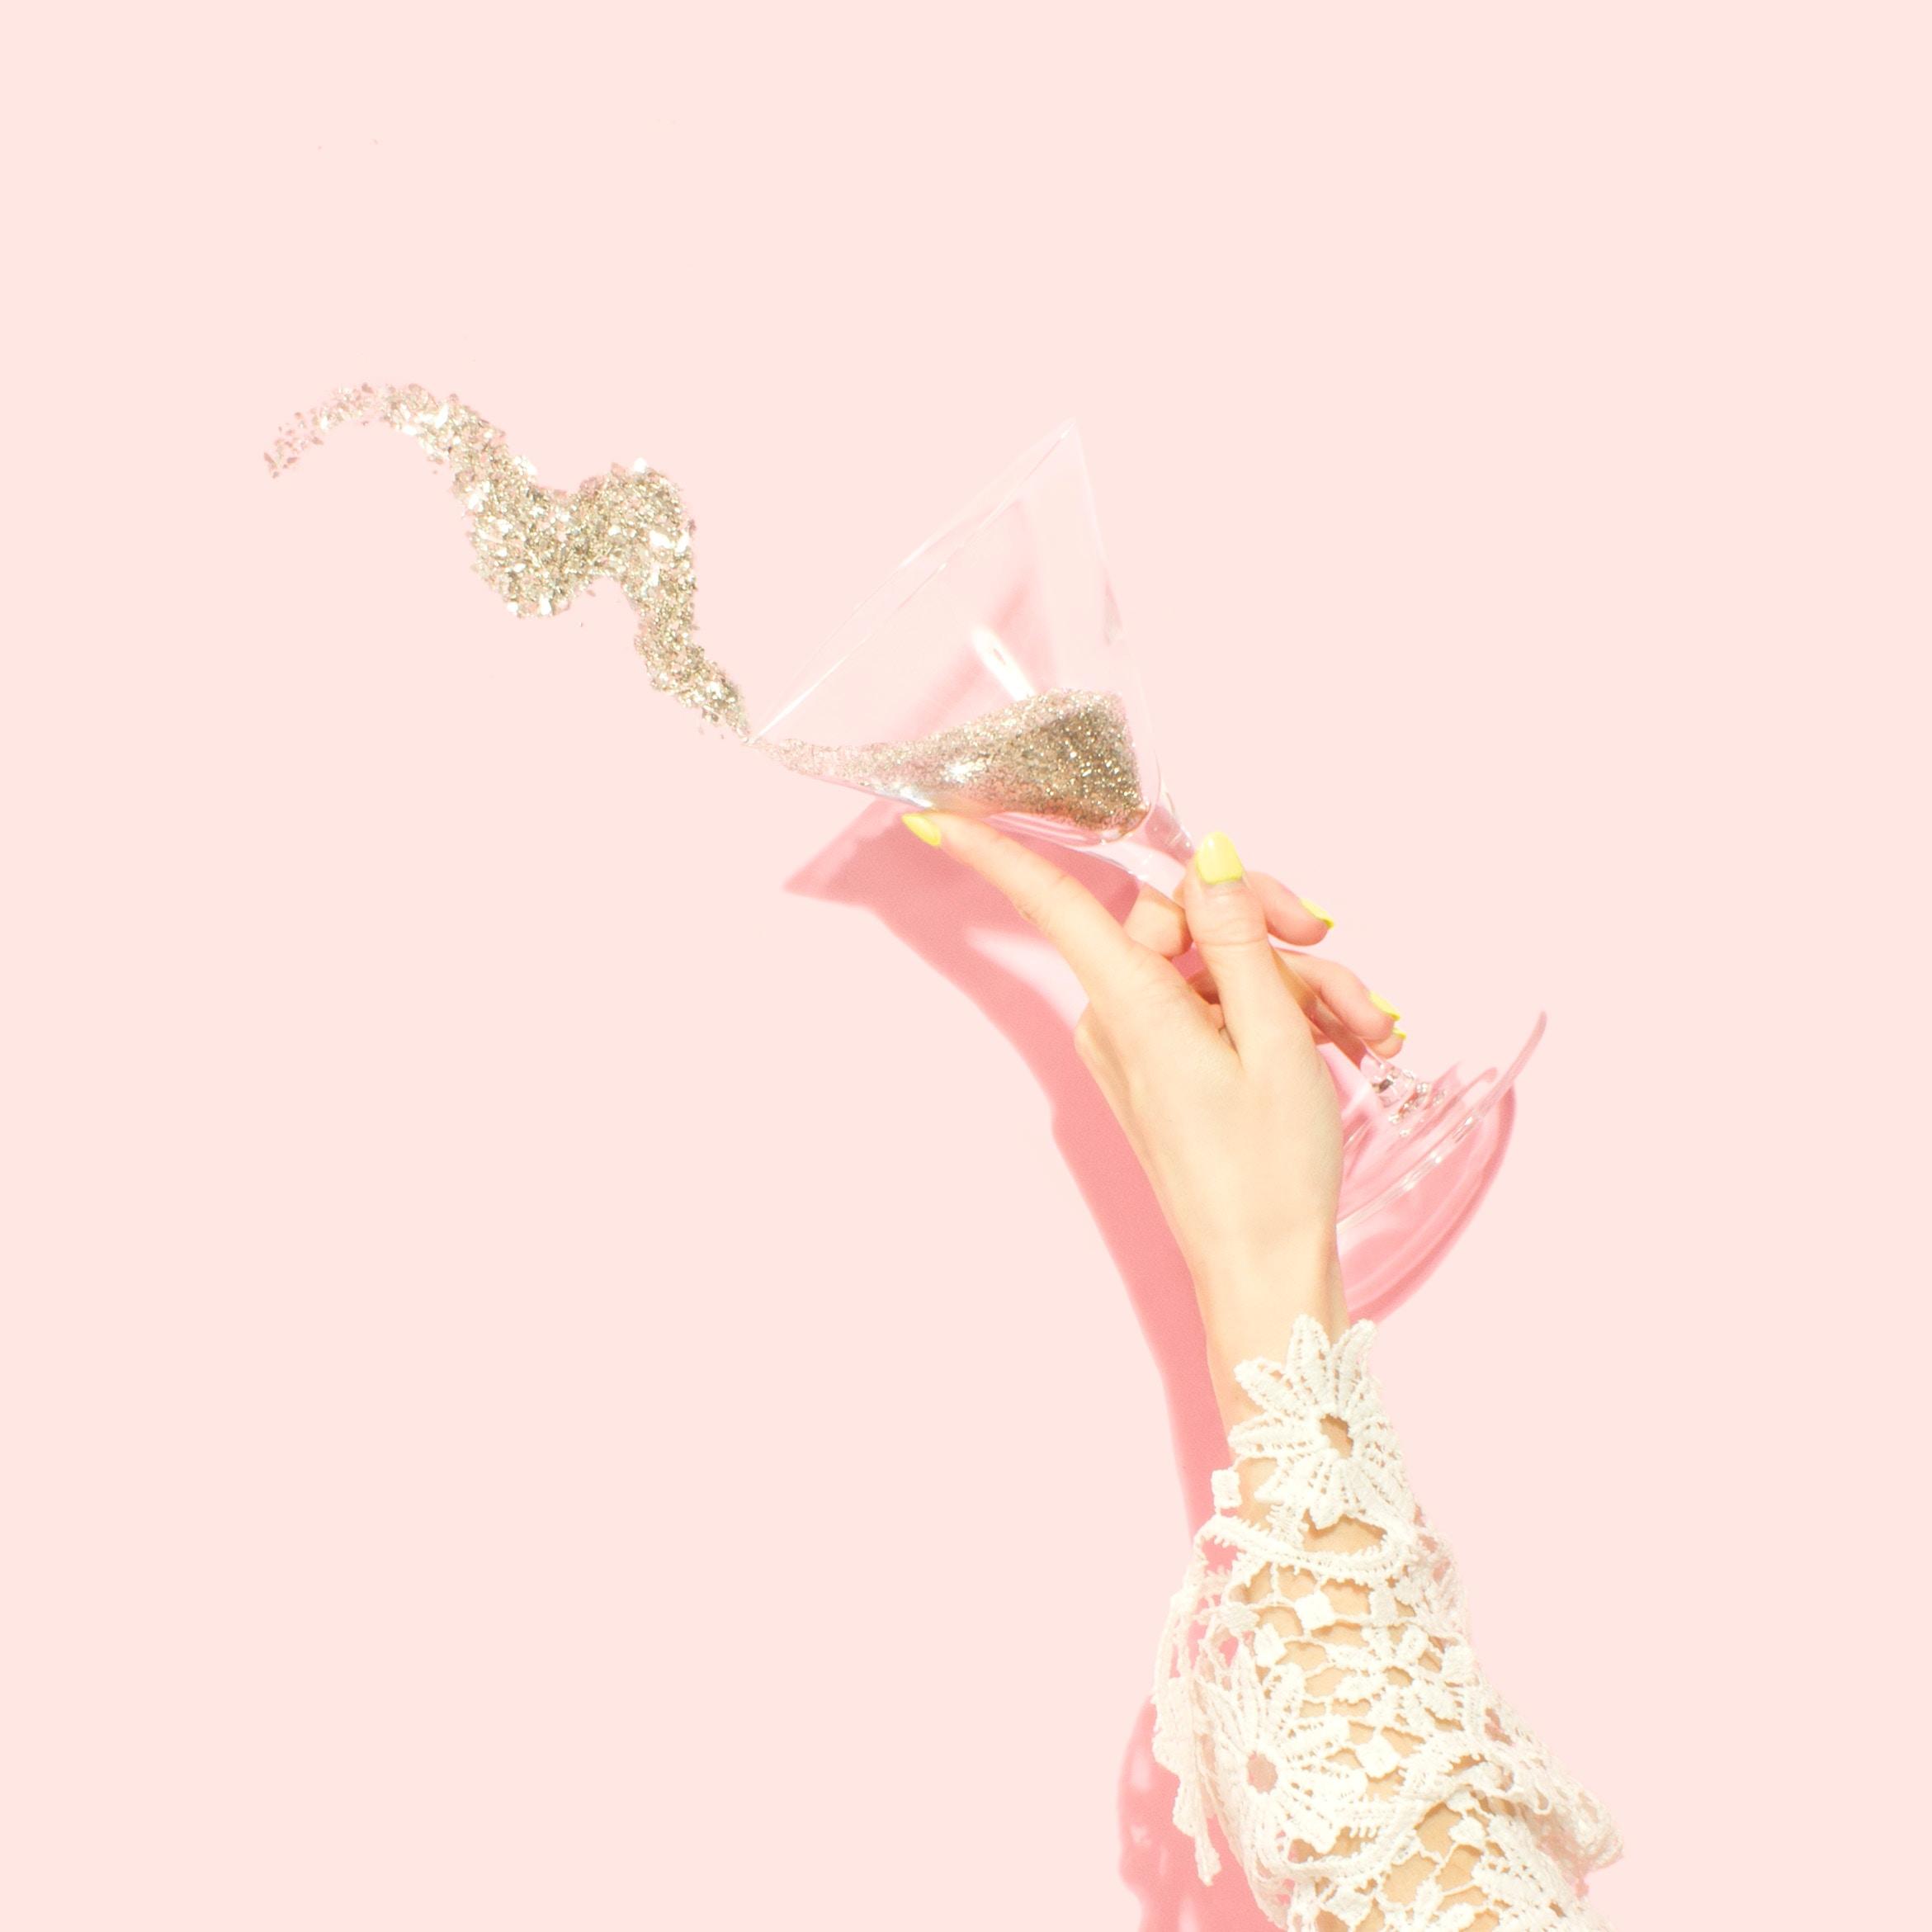 Martini glitter background by Amy Shamblen